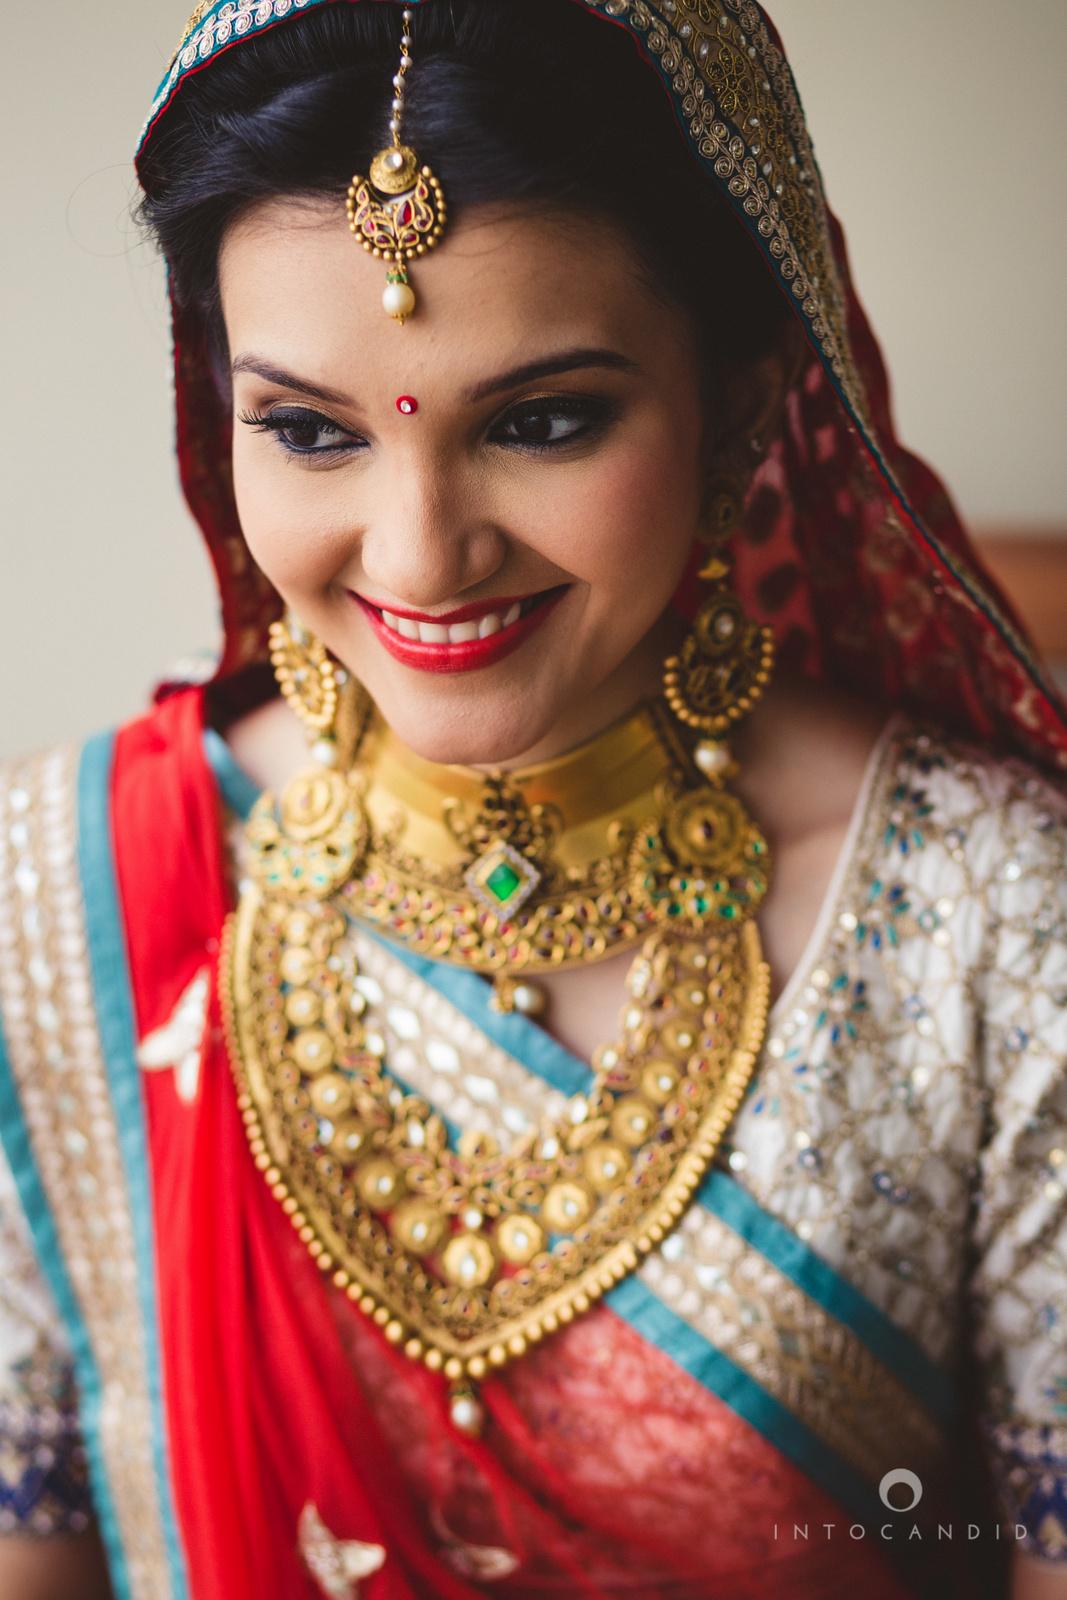 saharastar-mumbai-hindu-wedding-photography-intocandid-ma-017.jpg